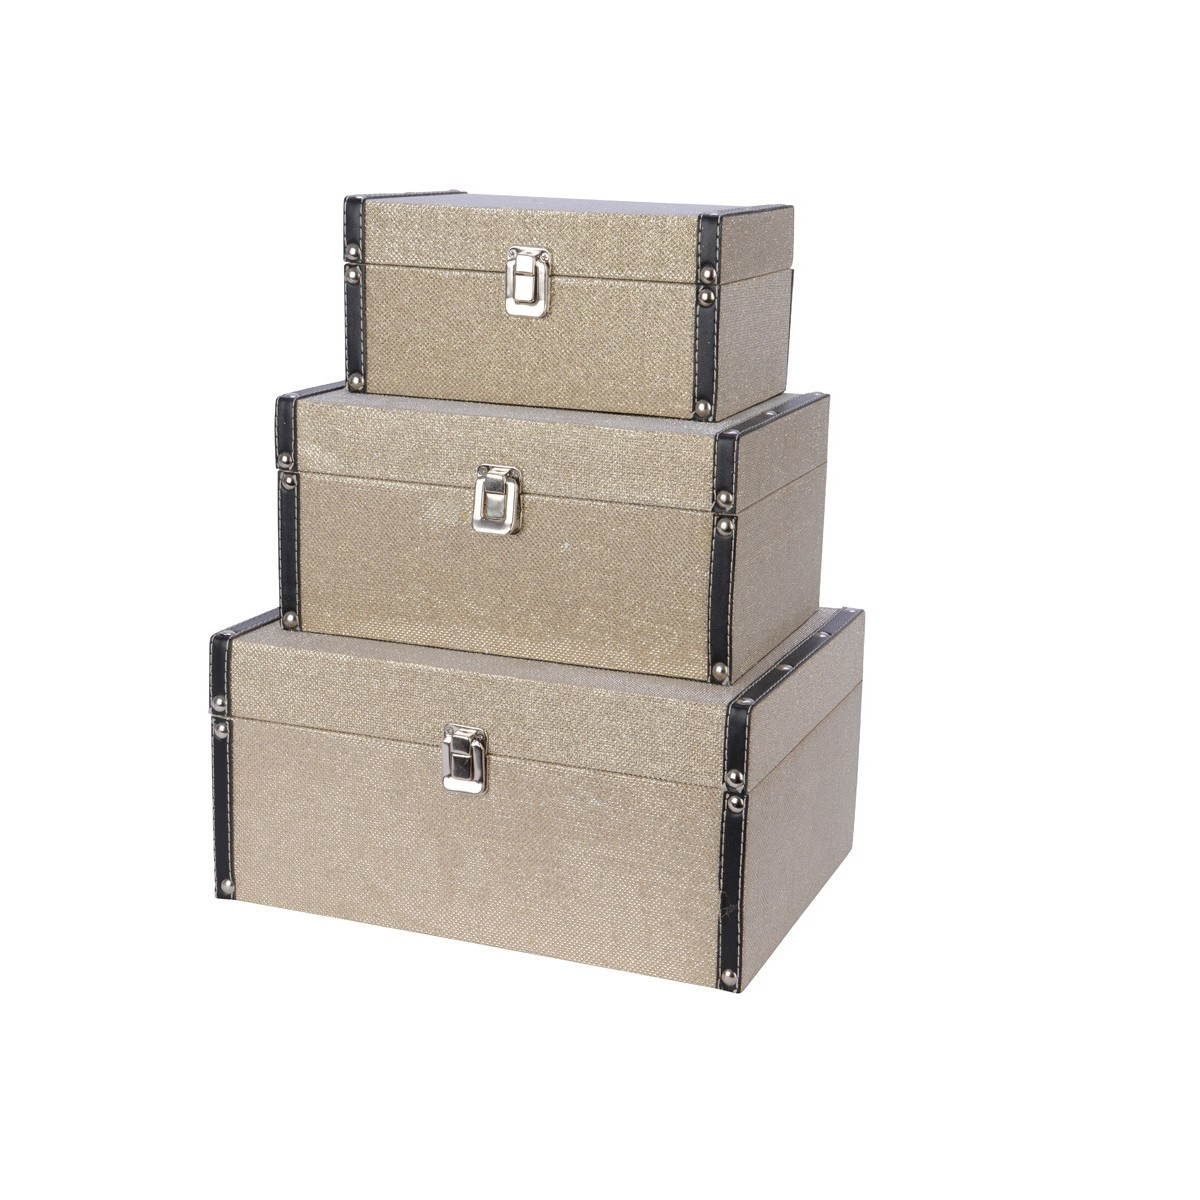 Baule Satinato con Rifiniture in Ecopelle cm 30 x 23 x 14